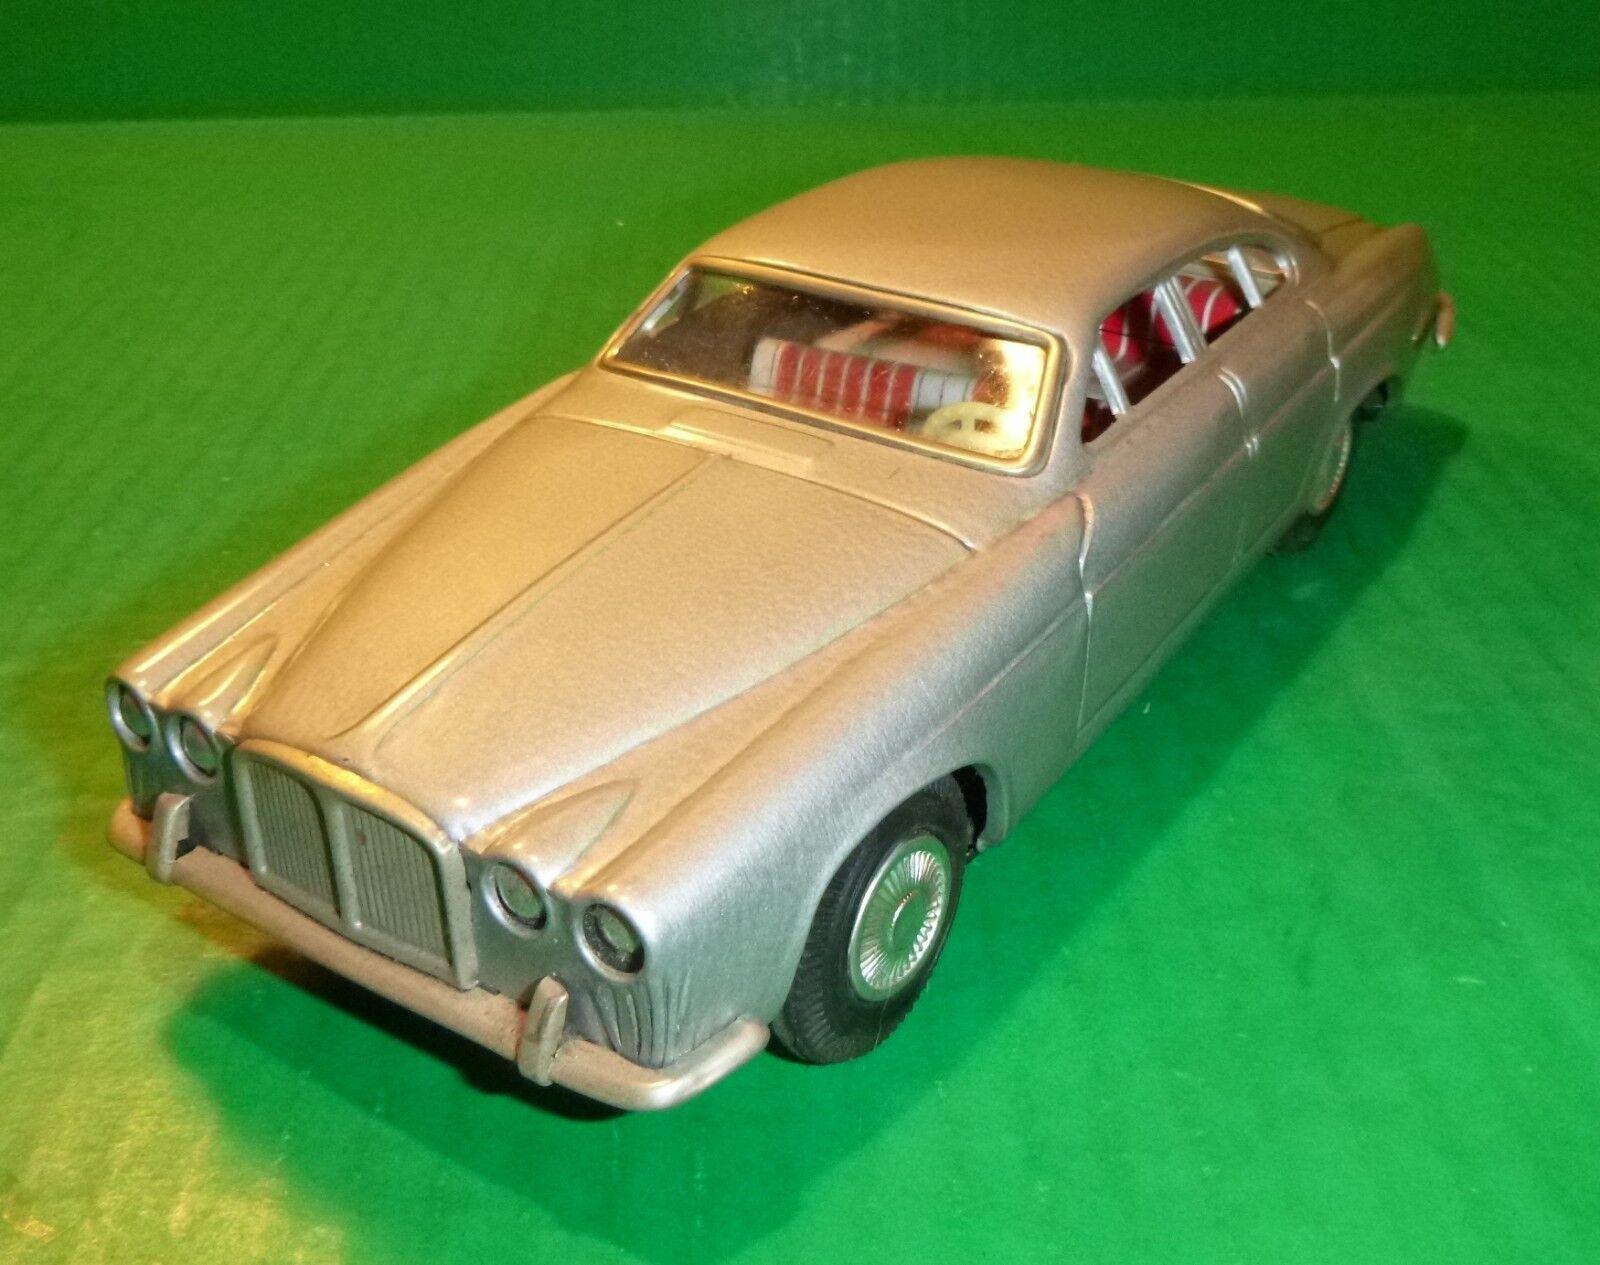 1970 Vintage Blech Litho Jaguar XJ Reibung Spielzeug Auto Taiyo Japan 24.1cm